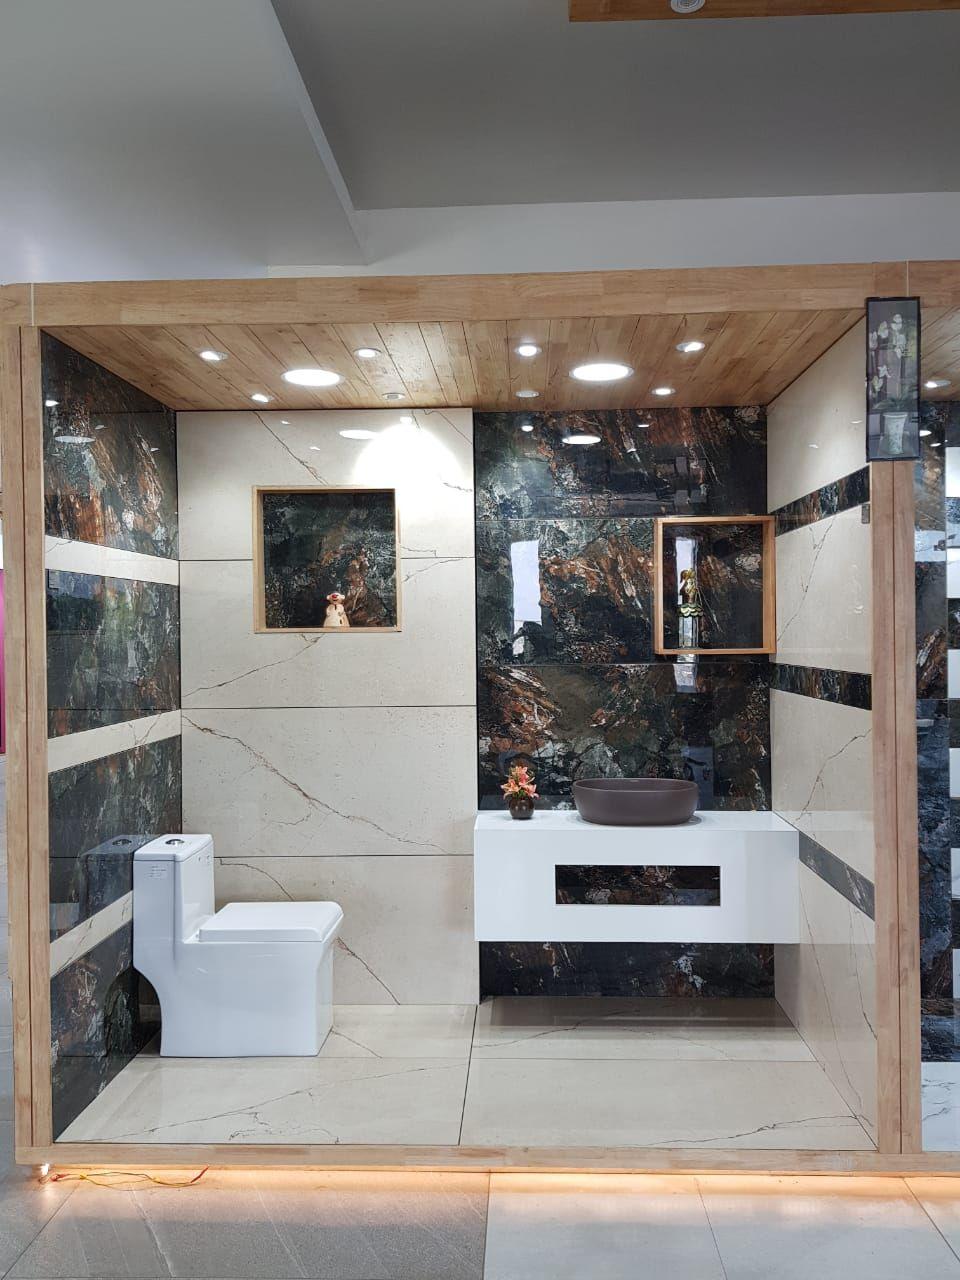 Pin By Keyur Khoont On Showroom Showroom Interior Design Bathroom Design Small Tile Showroom